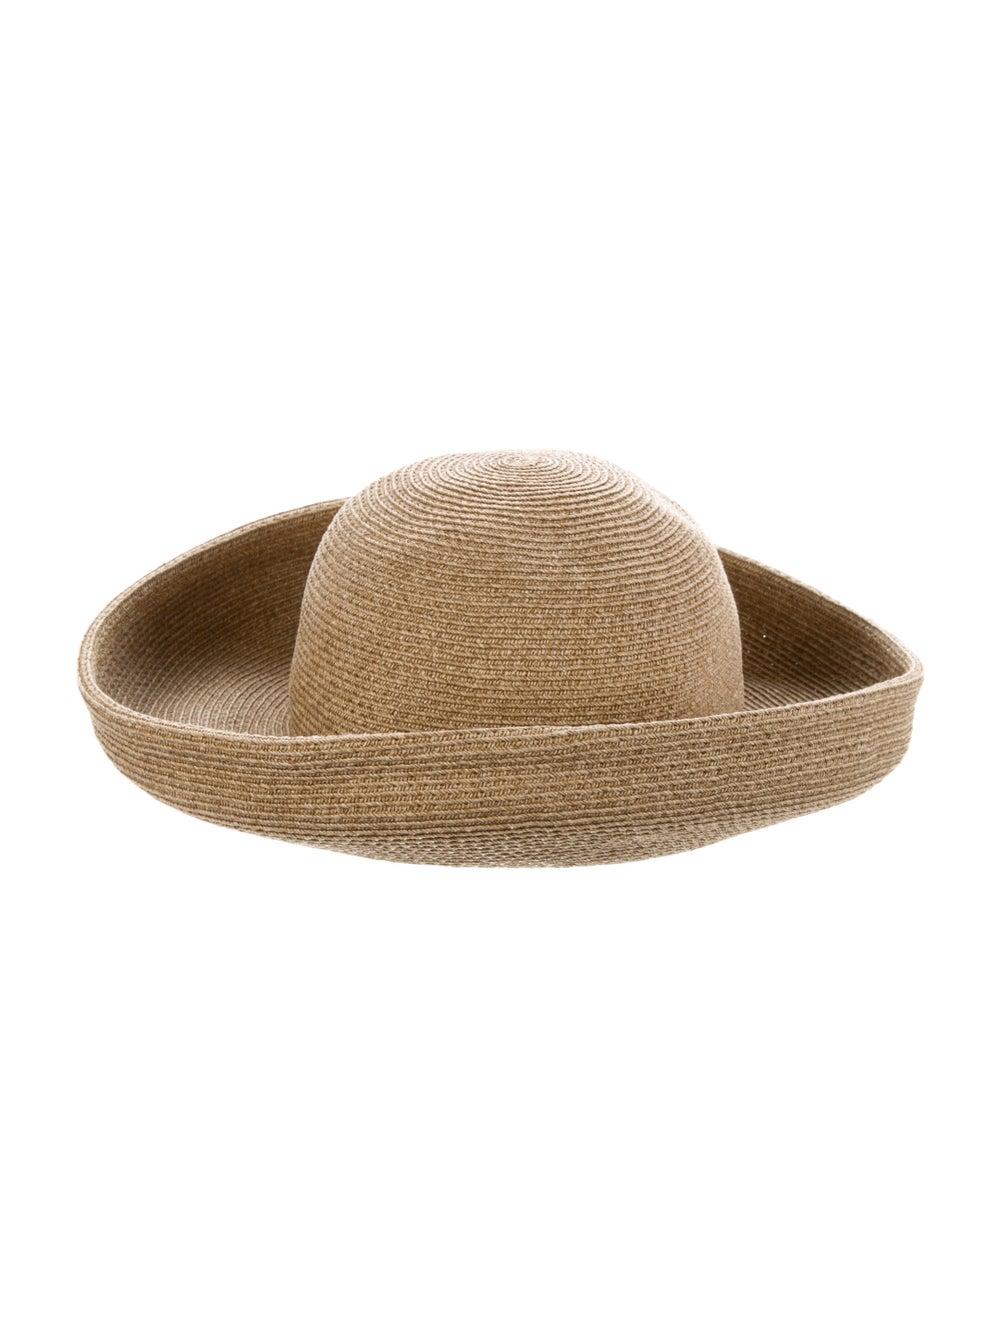 Eric Javits Straw Wide-Brim Hat - image 2